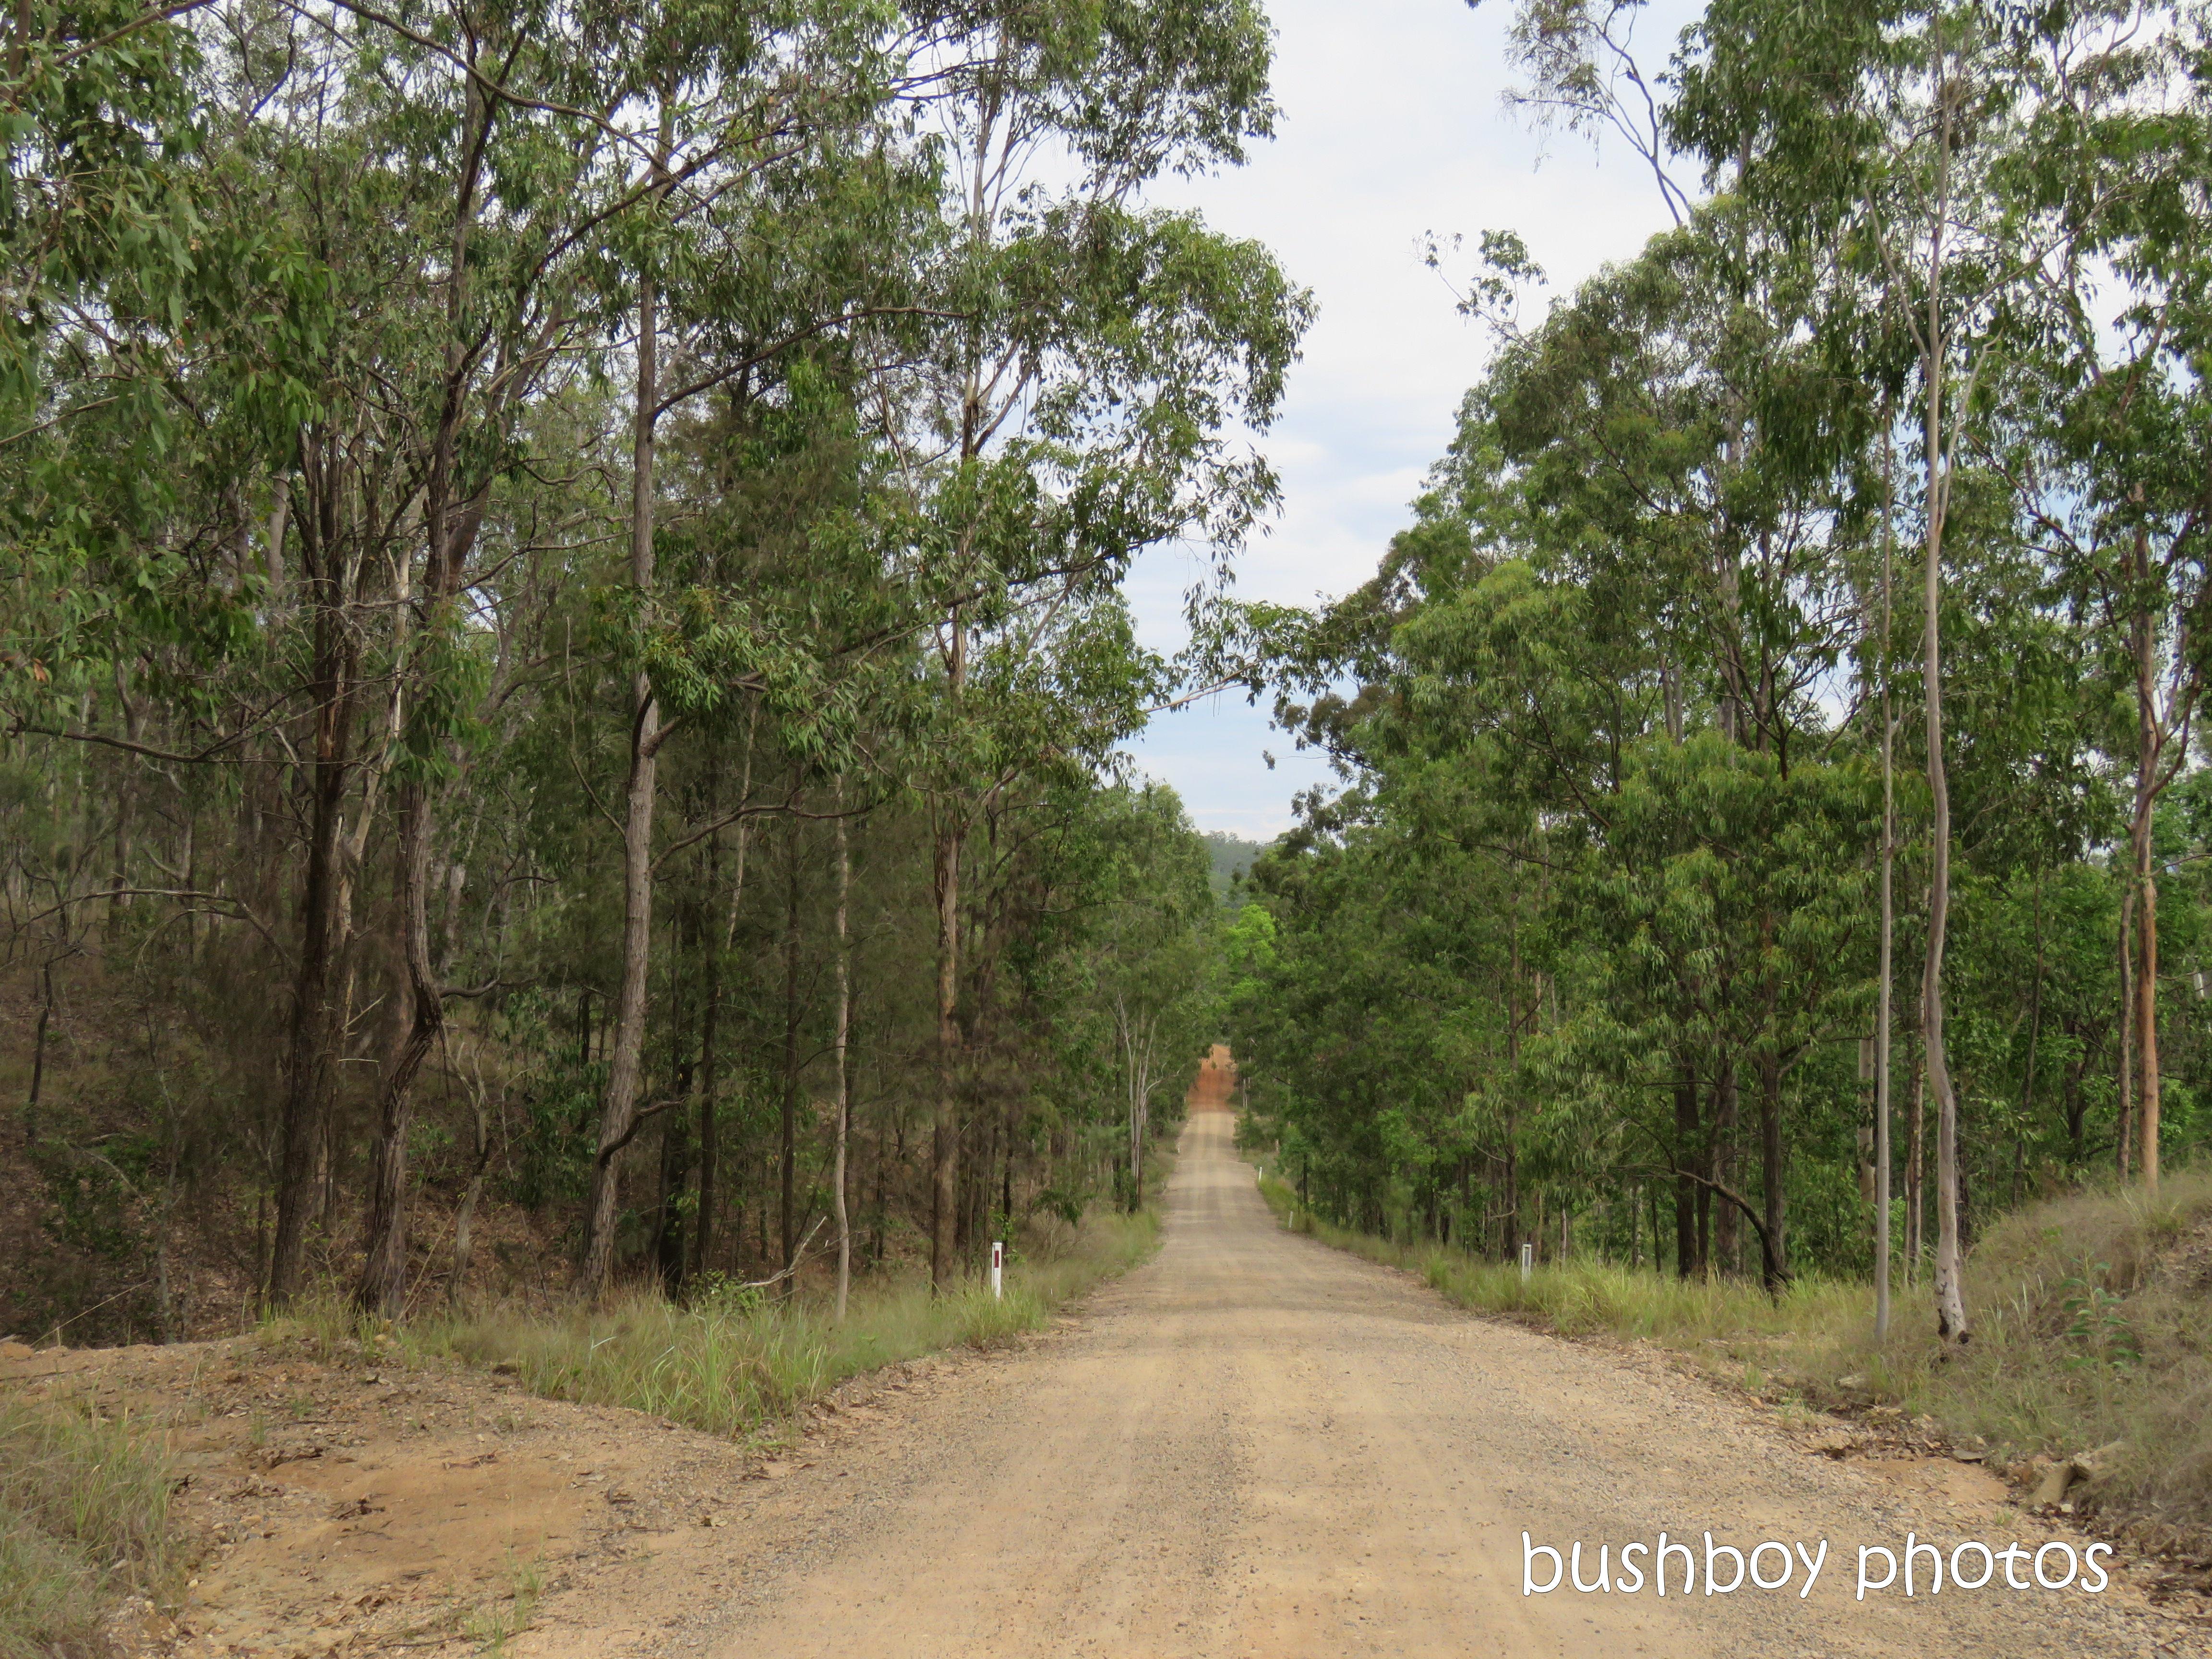 190326_blog_challenge_roads_lilydale_home3